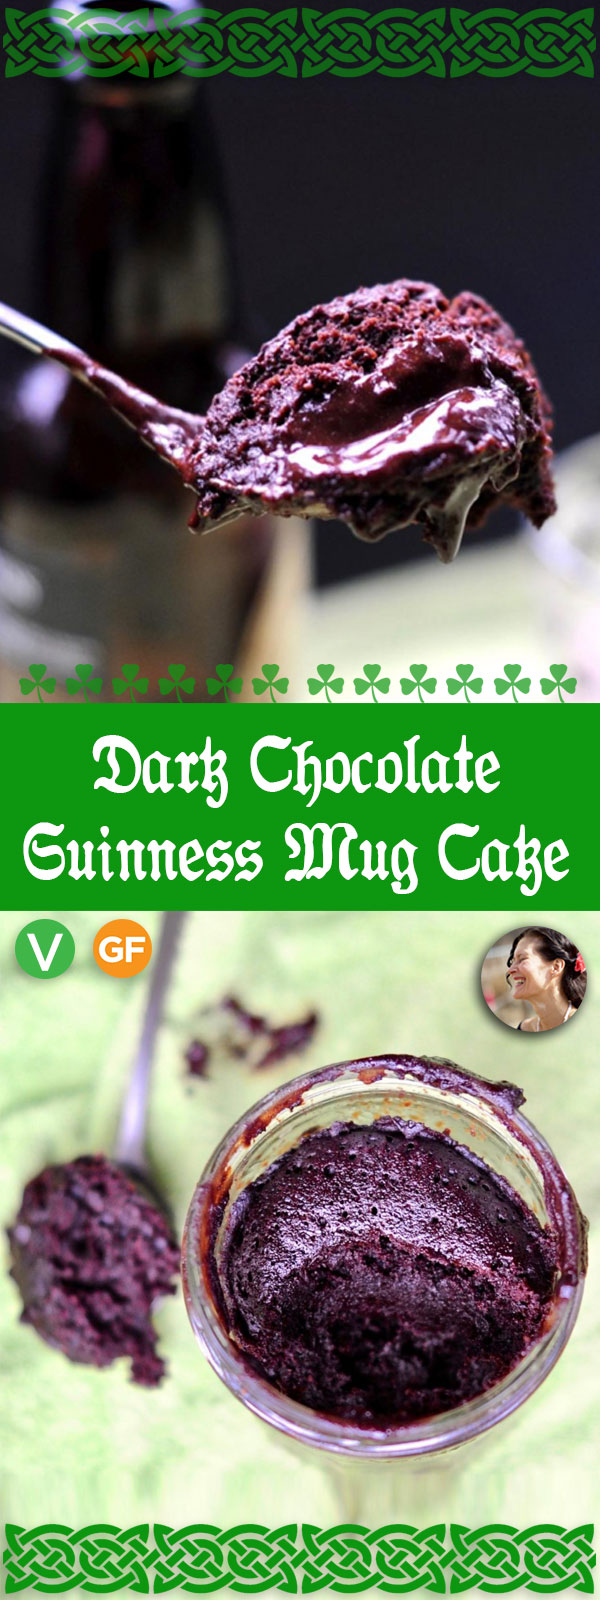 Dark Chocolate Guinness Mug Cake, Vegan